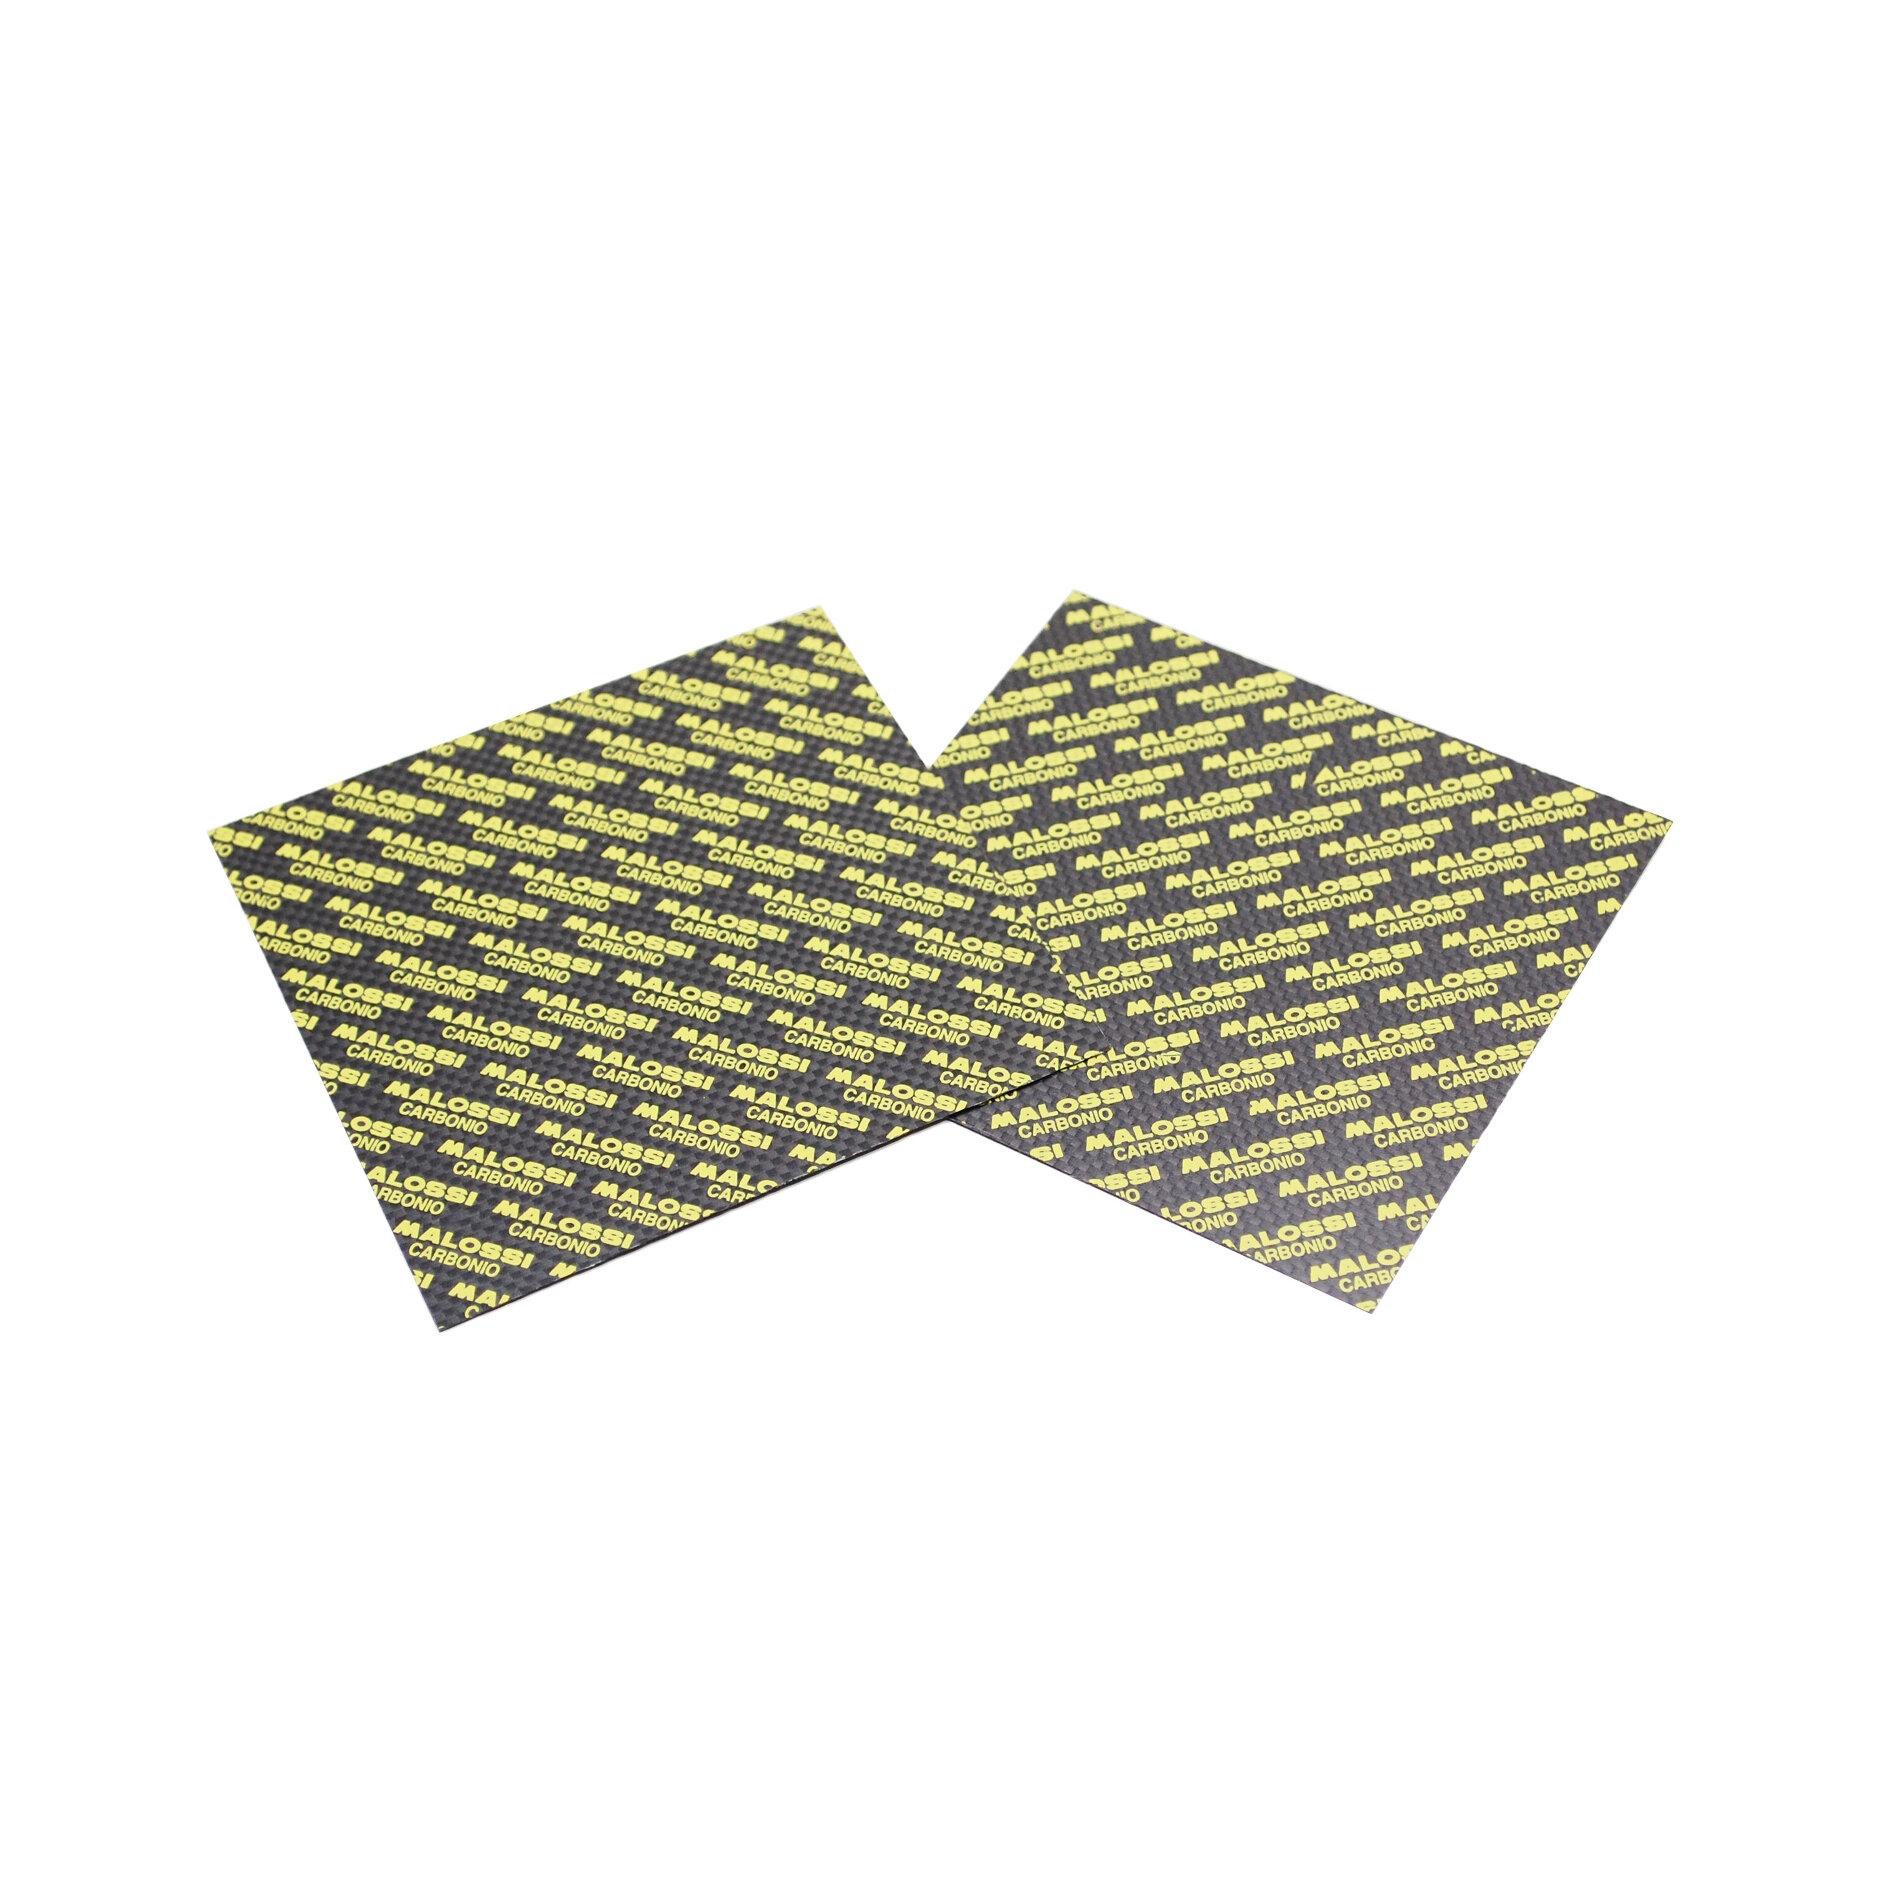 2 Plaques Carbone Malossi à découper 100x100mm - 0.30